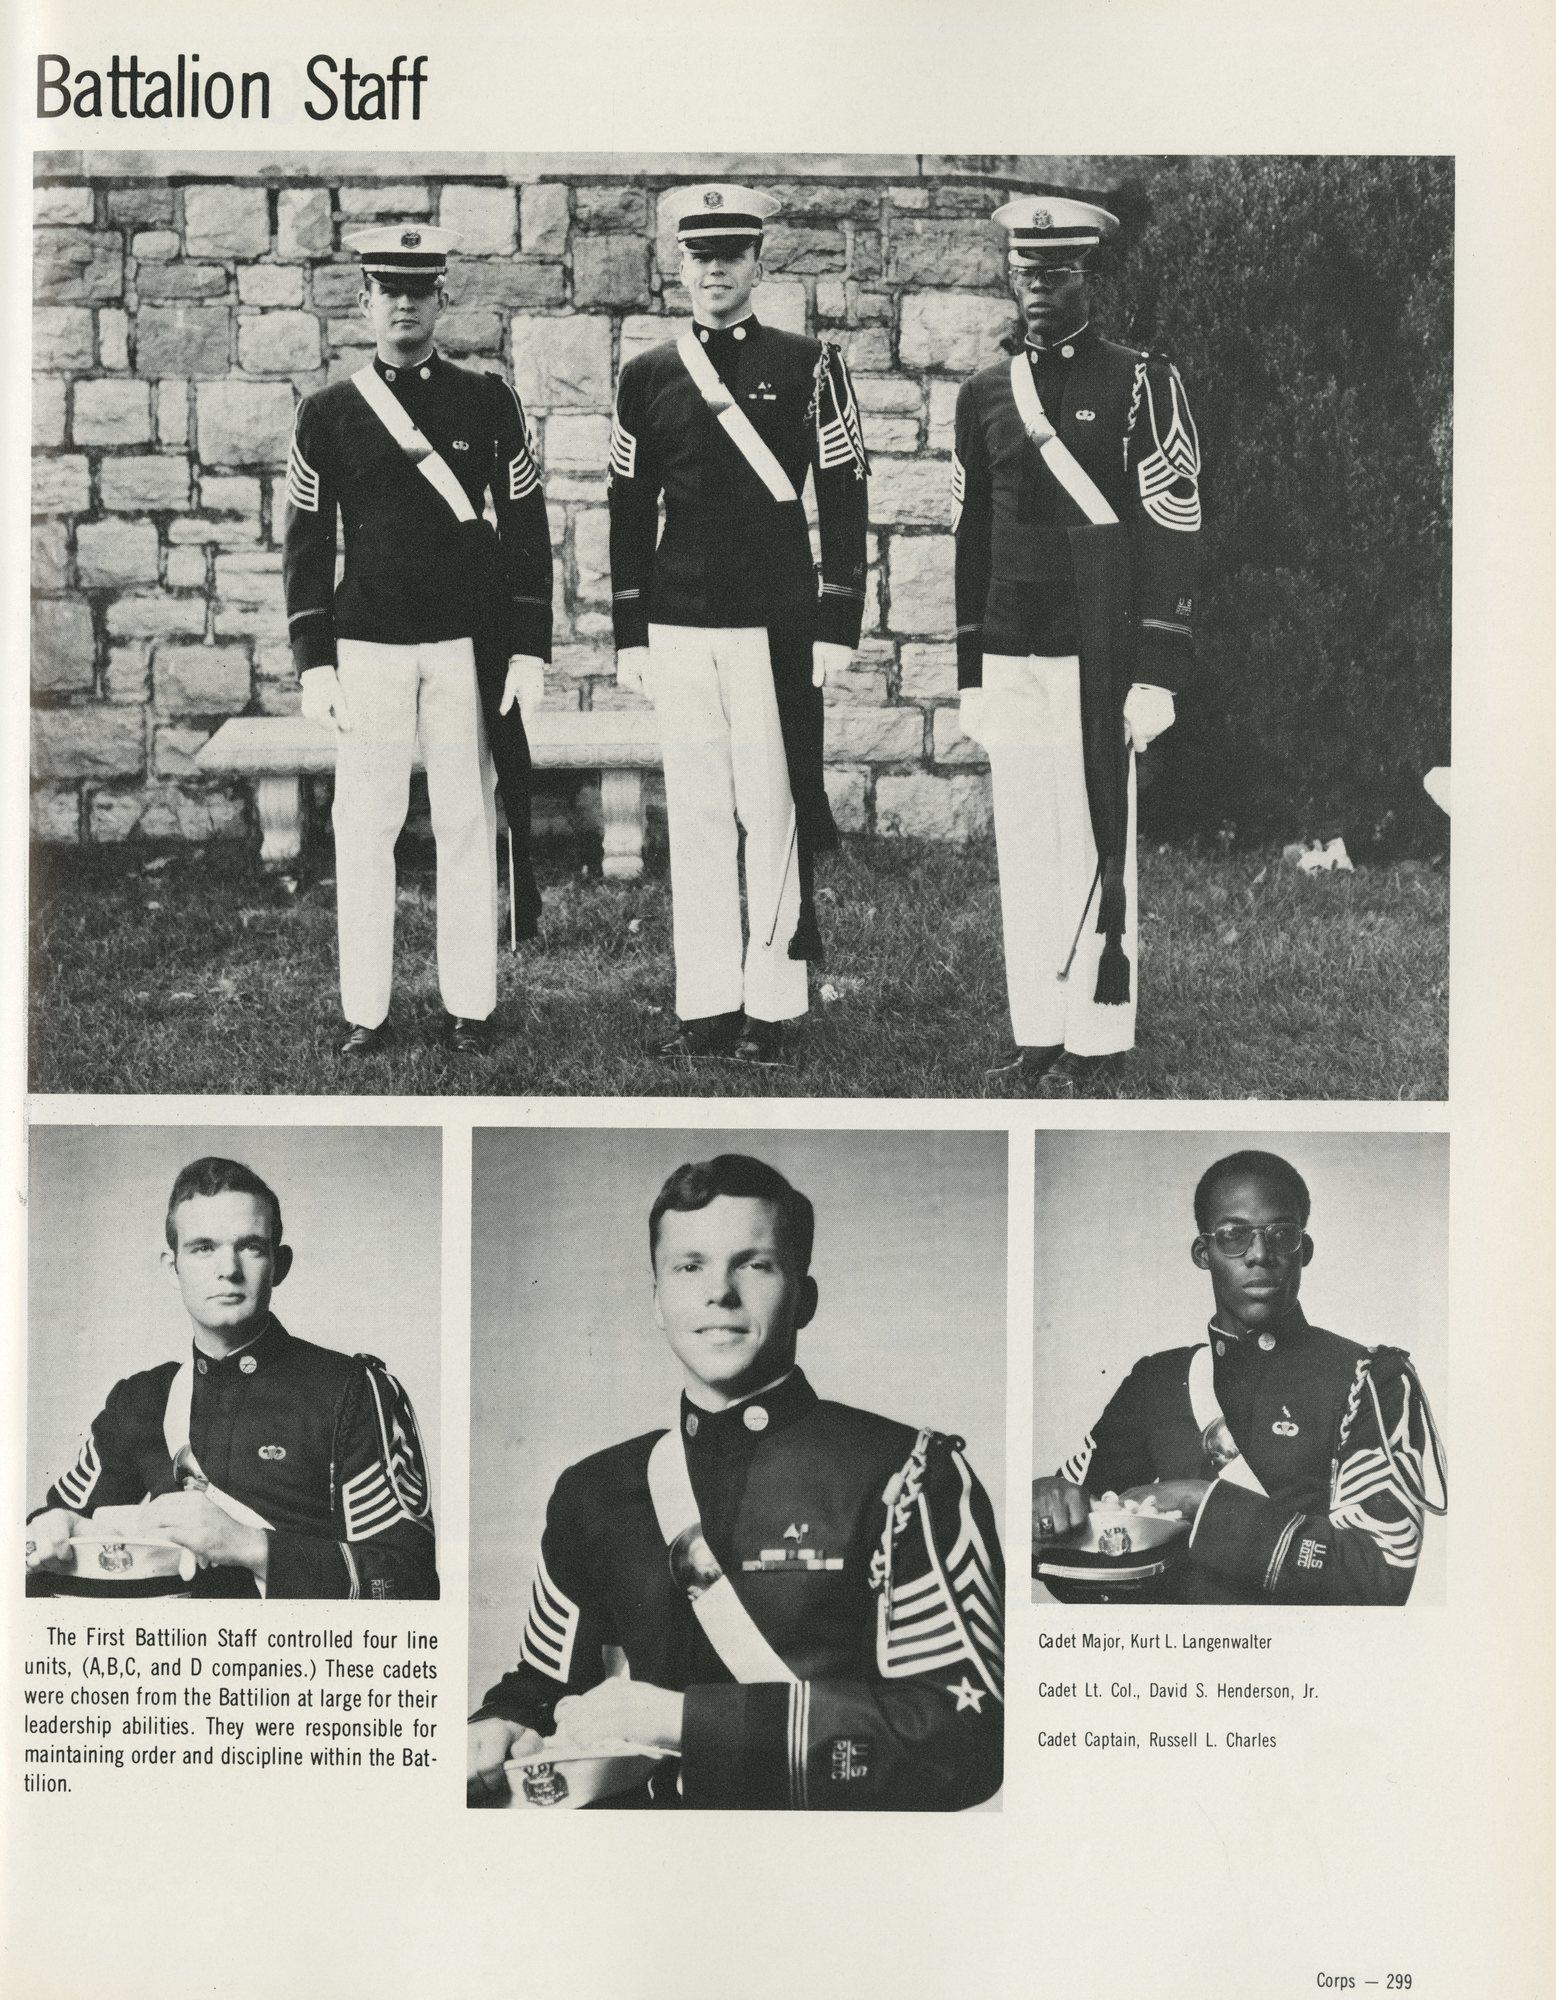 http://spec.lib.vt.edu/pickup/Omeka_upload/1978_Bugle_pg299_Battalion.jpg